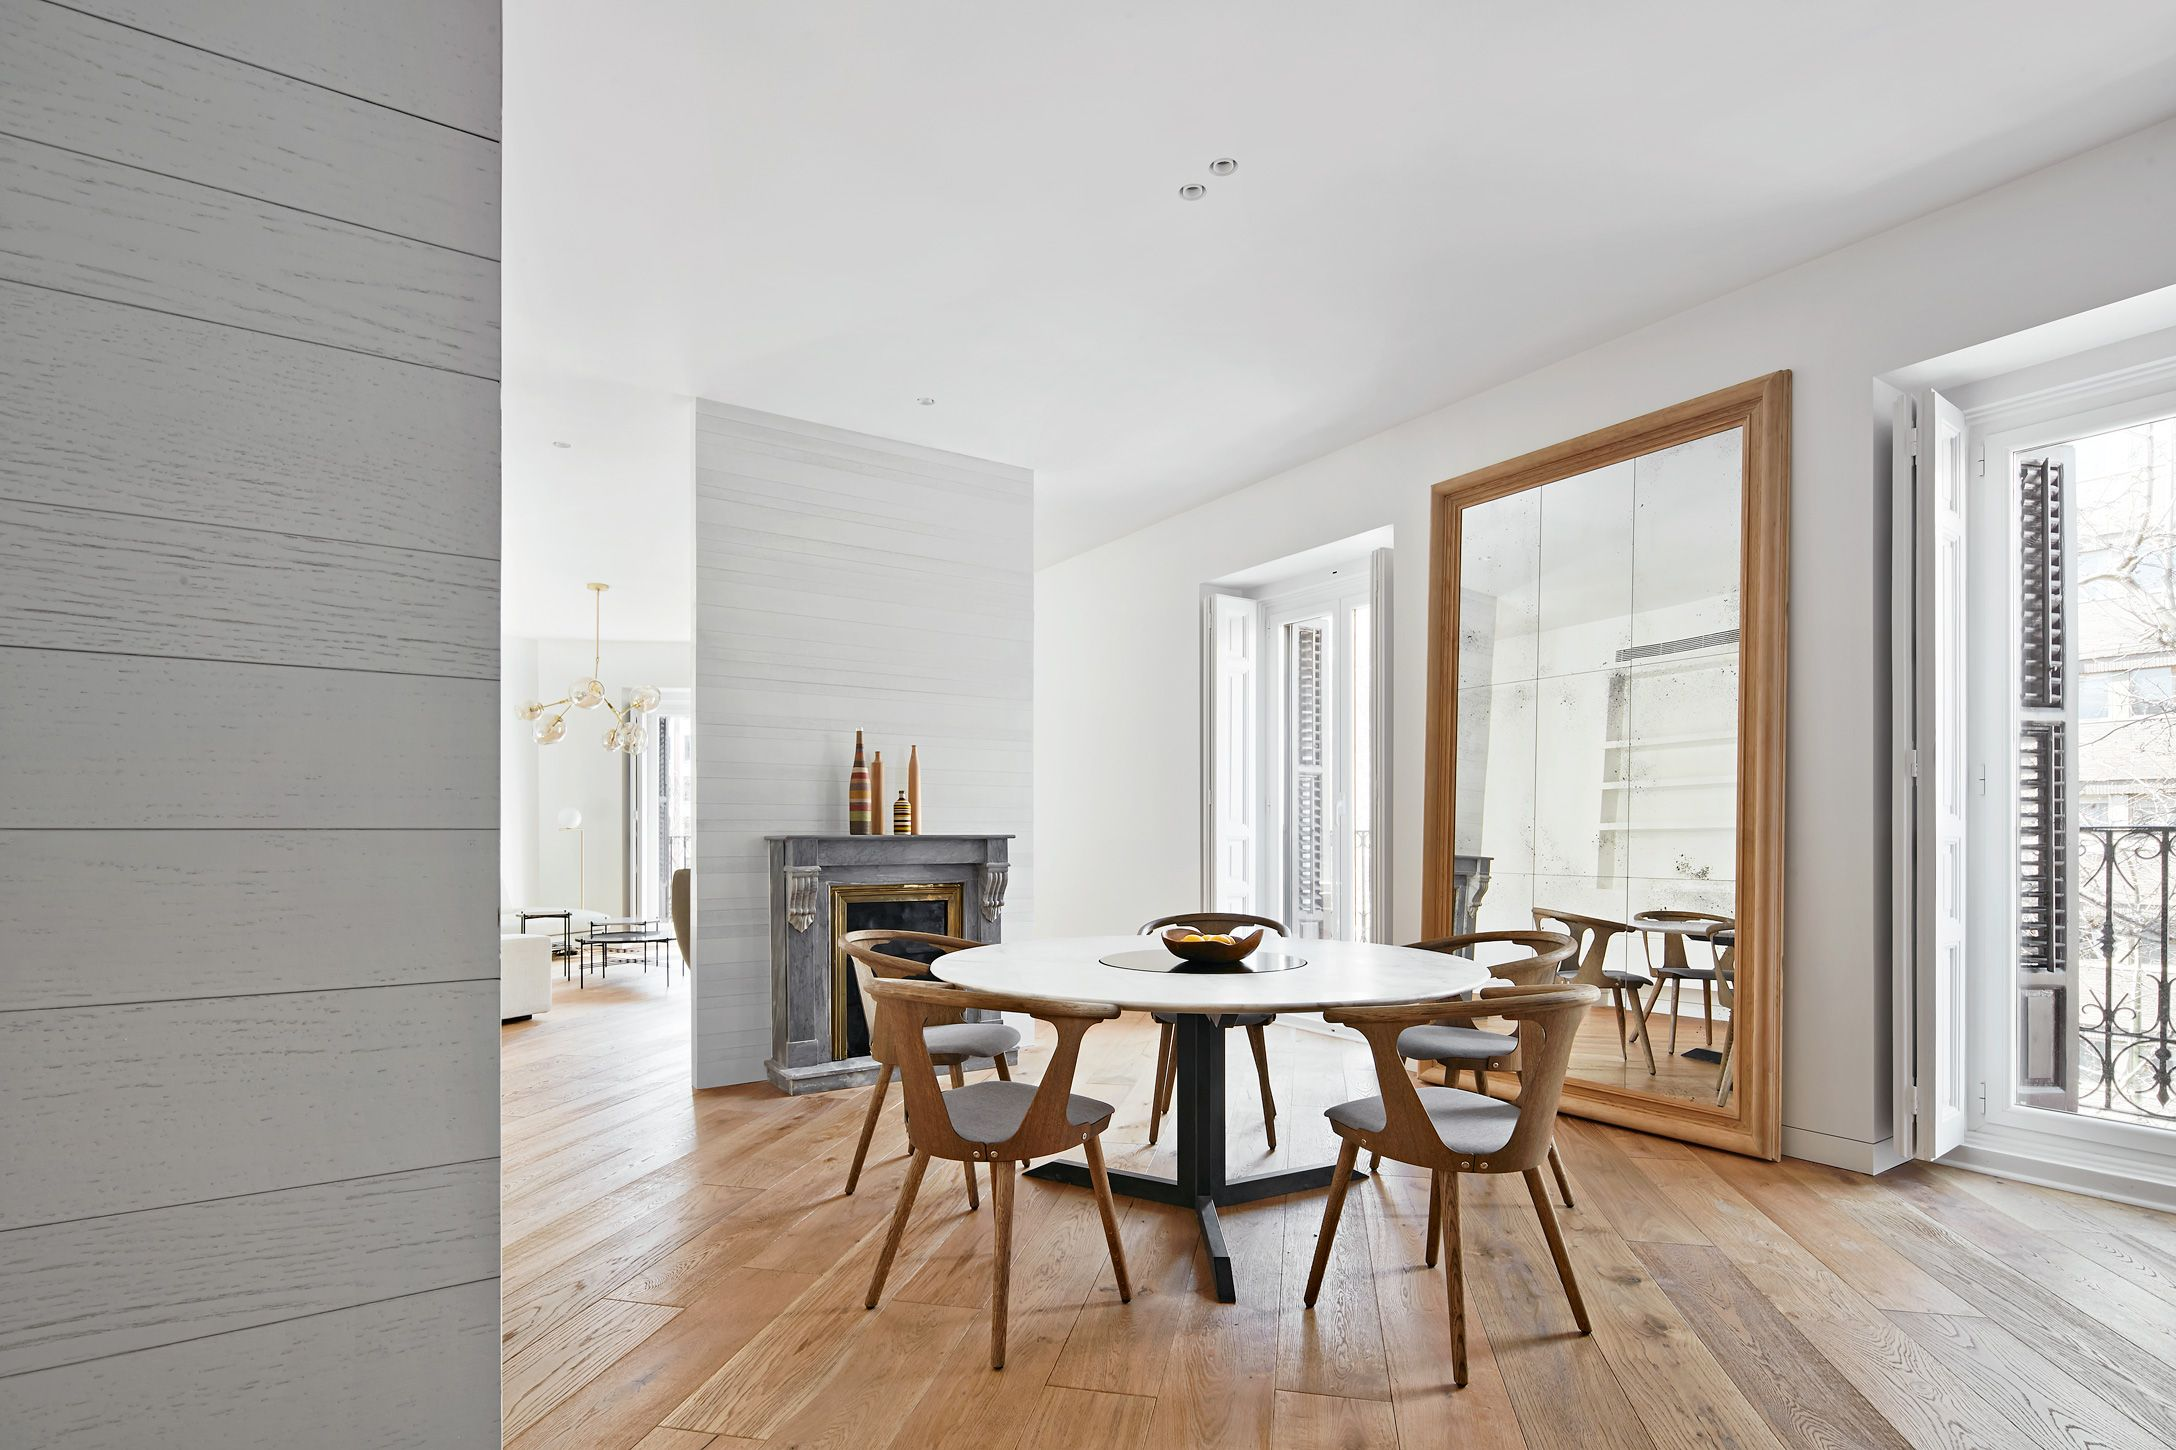 Casa PV2 |A modern apartment in Madrid - House-Diaries.com